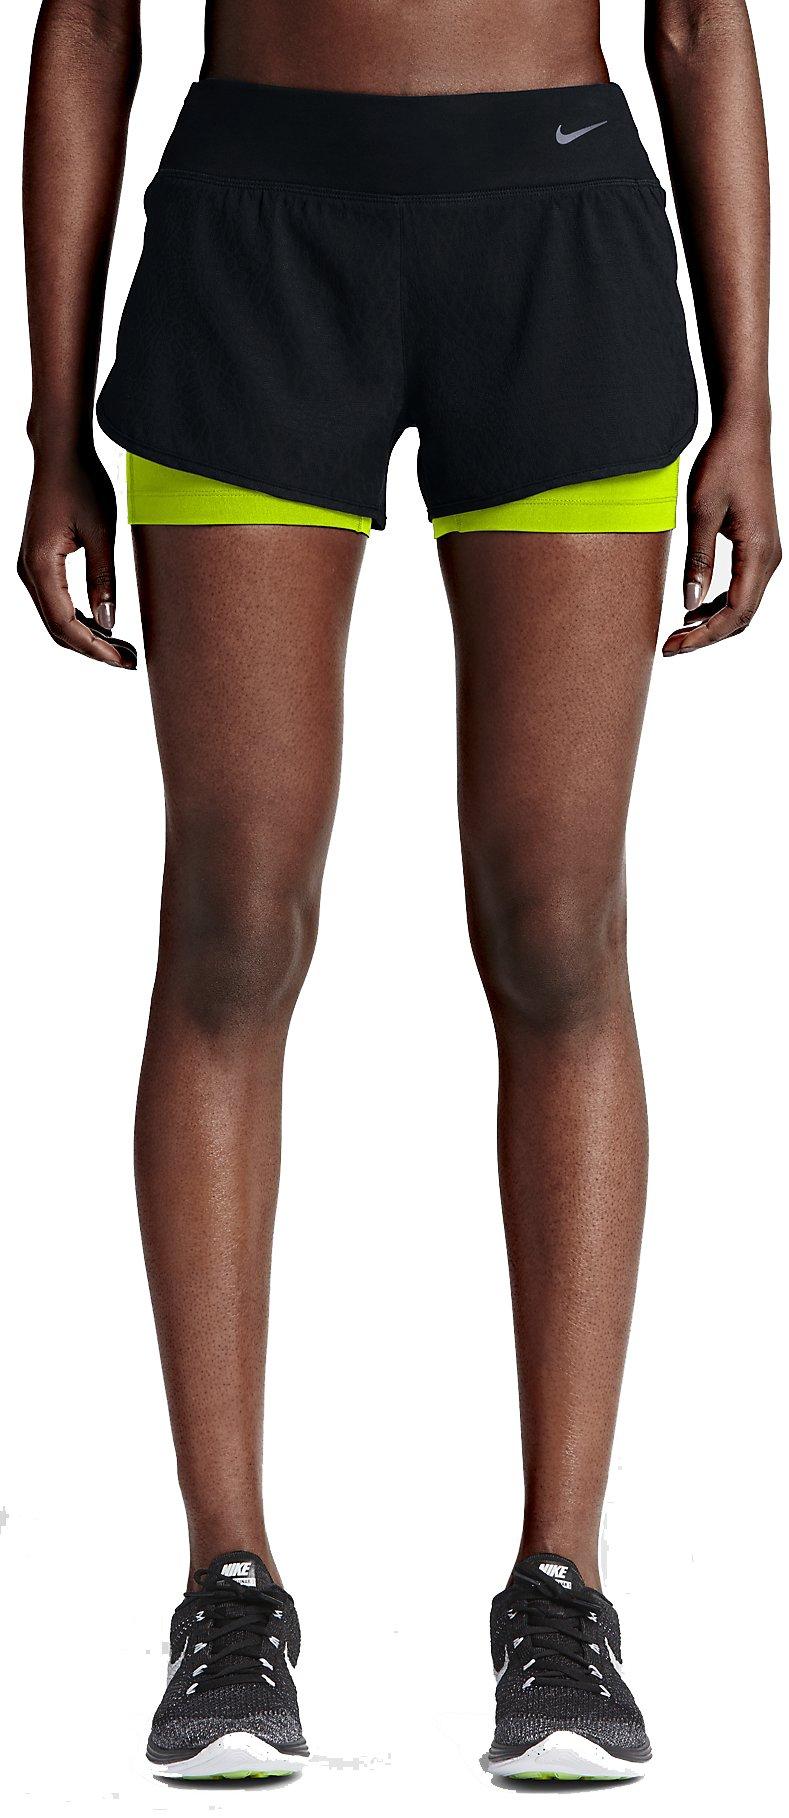 Šortky se slipy Nike 3